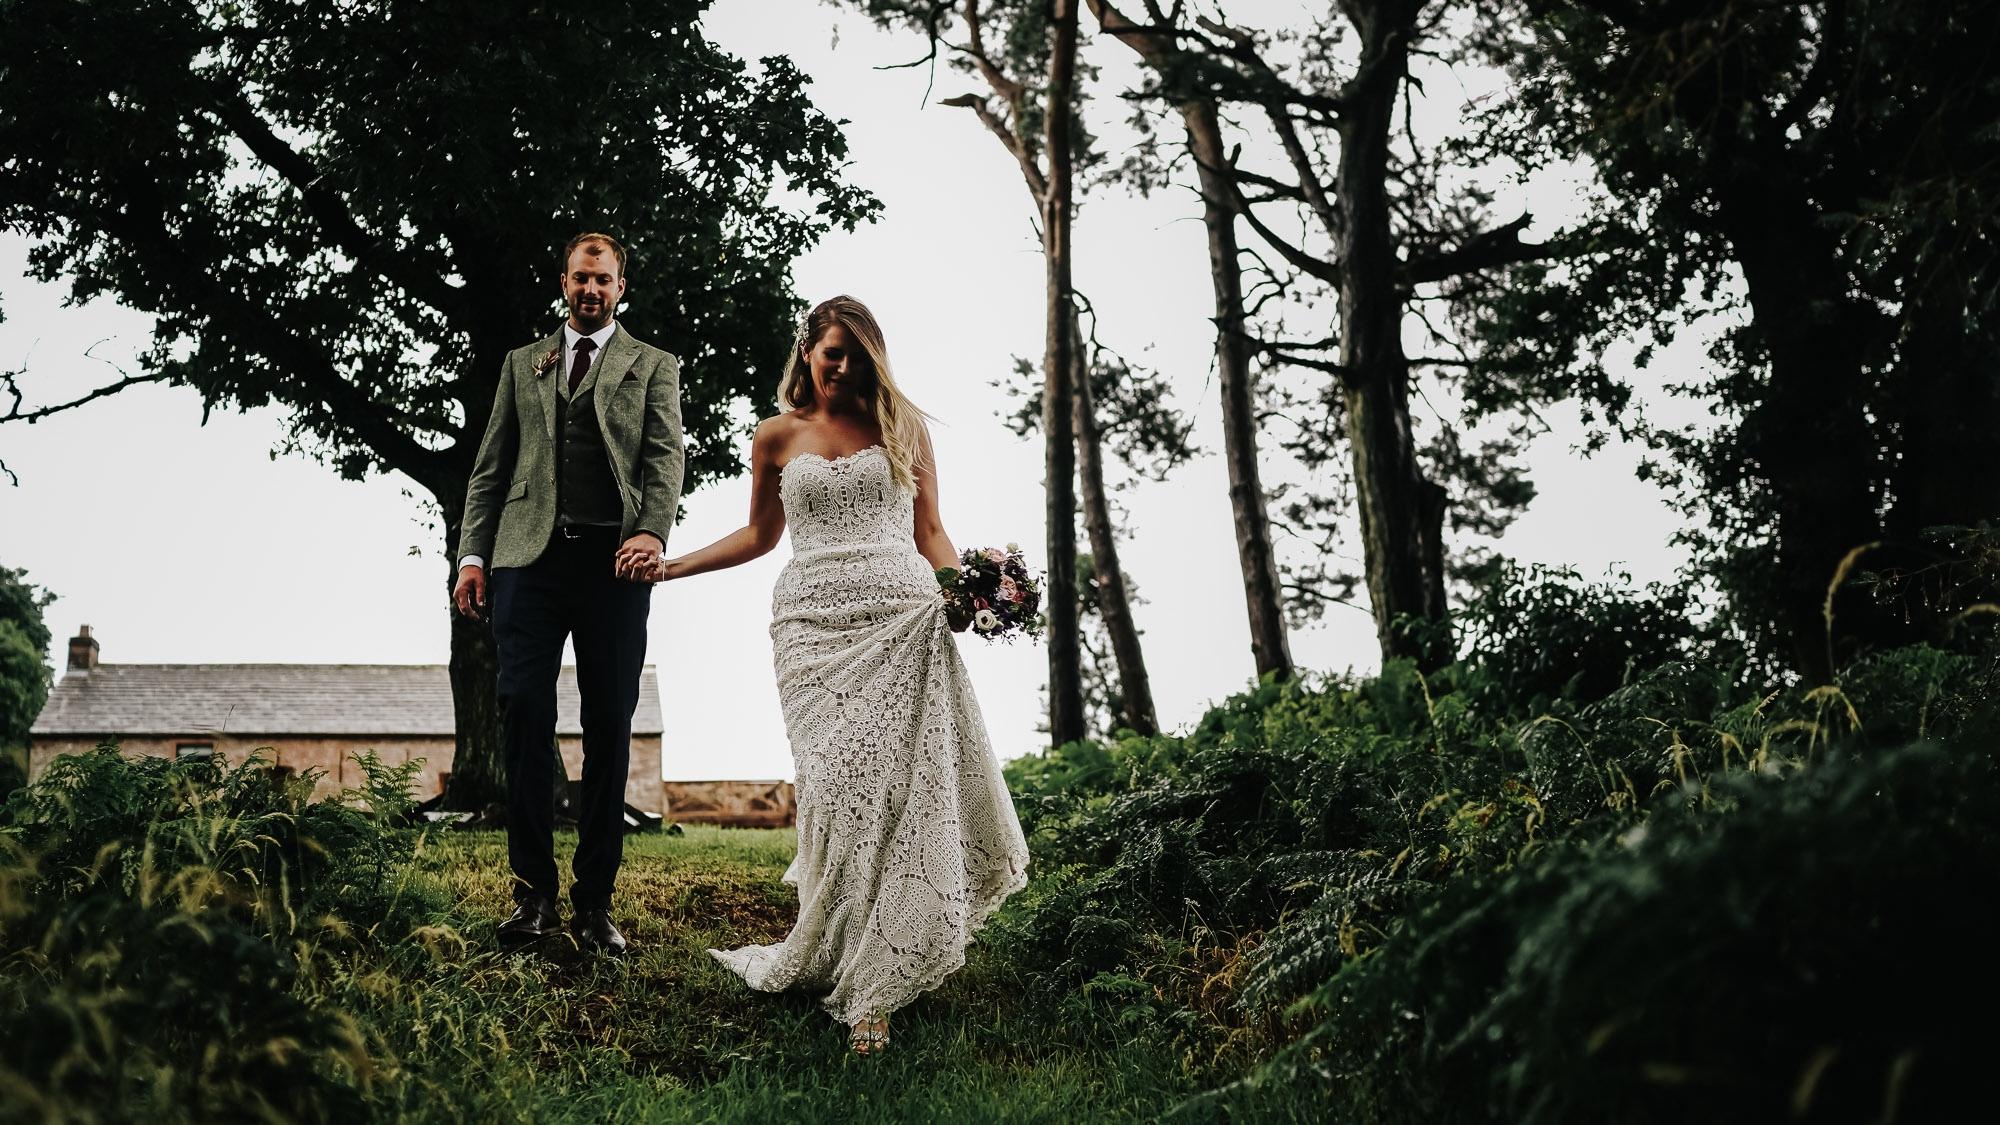 High+Barn+Wedding+photographer+lake+distect+penrith+documentry+wedding+photography+%2834+of+57%29.jpg